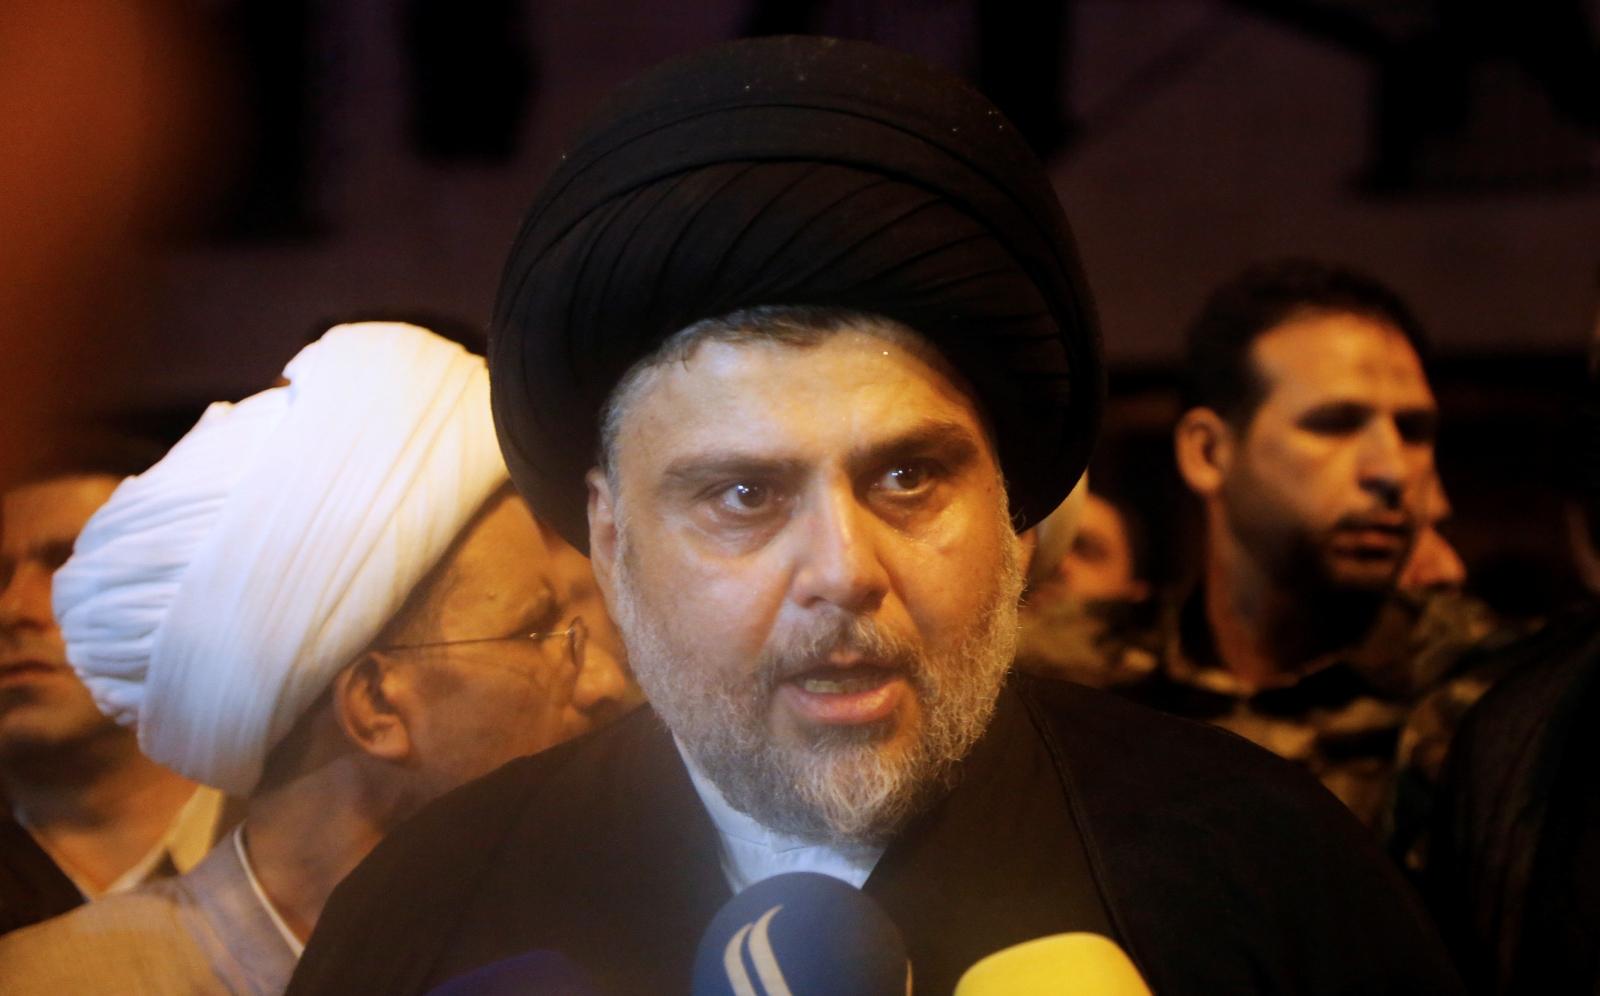 Iraqi Shi'ite cleric Muqtada al-Sadr